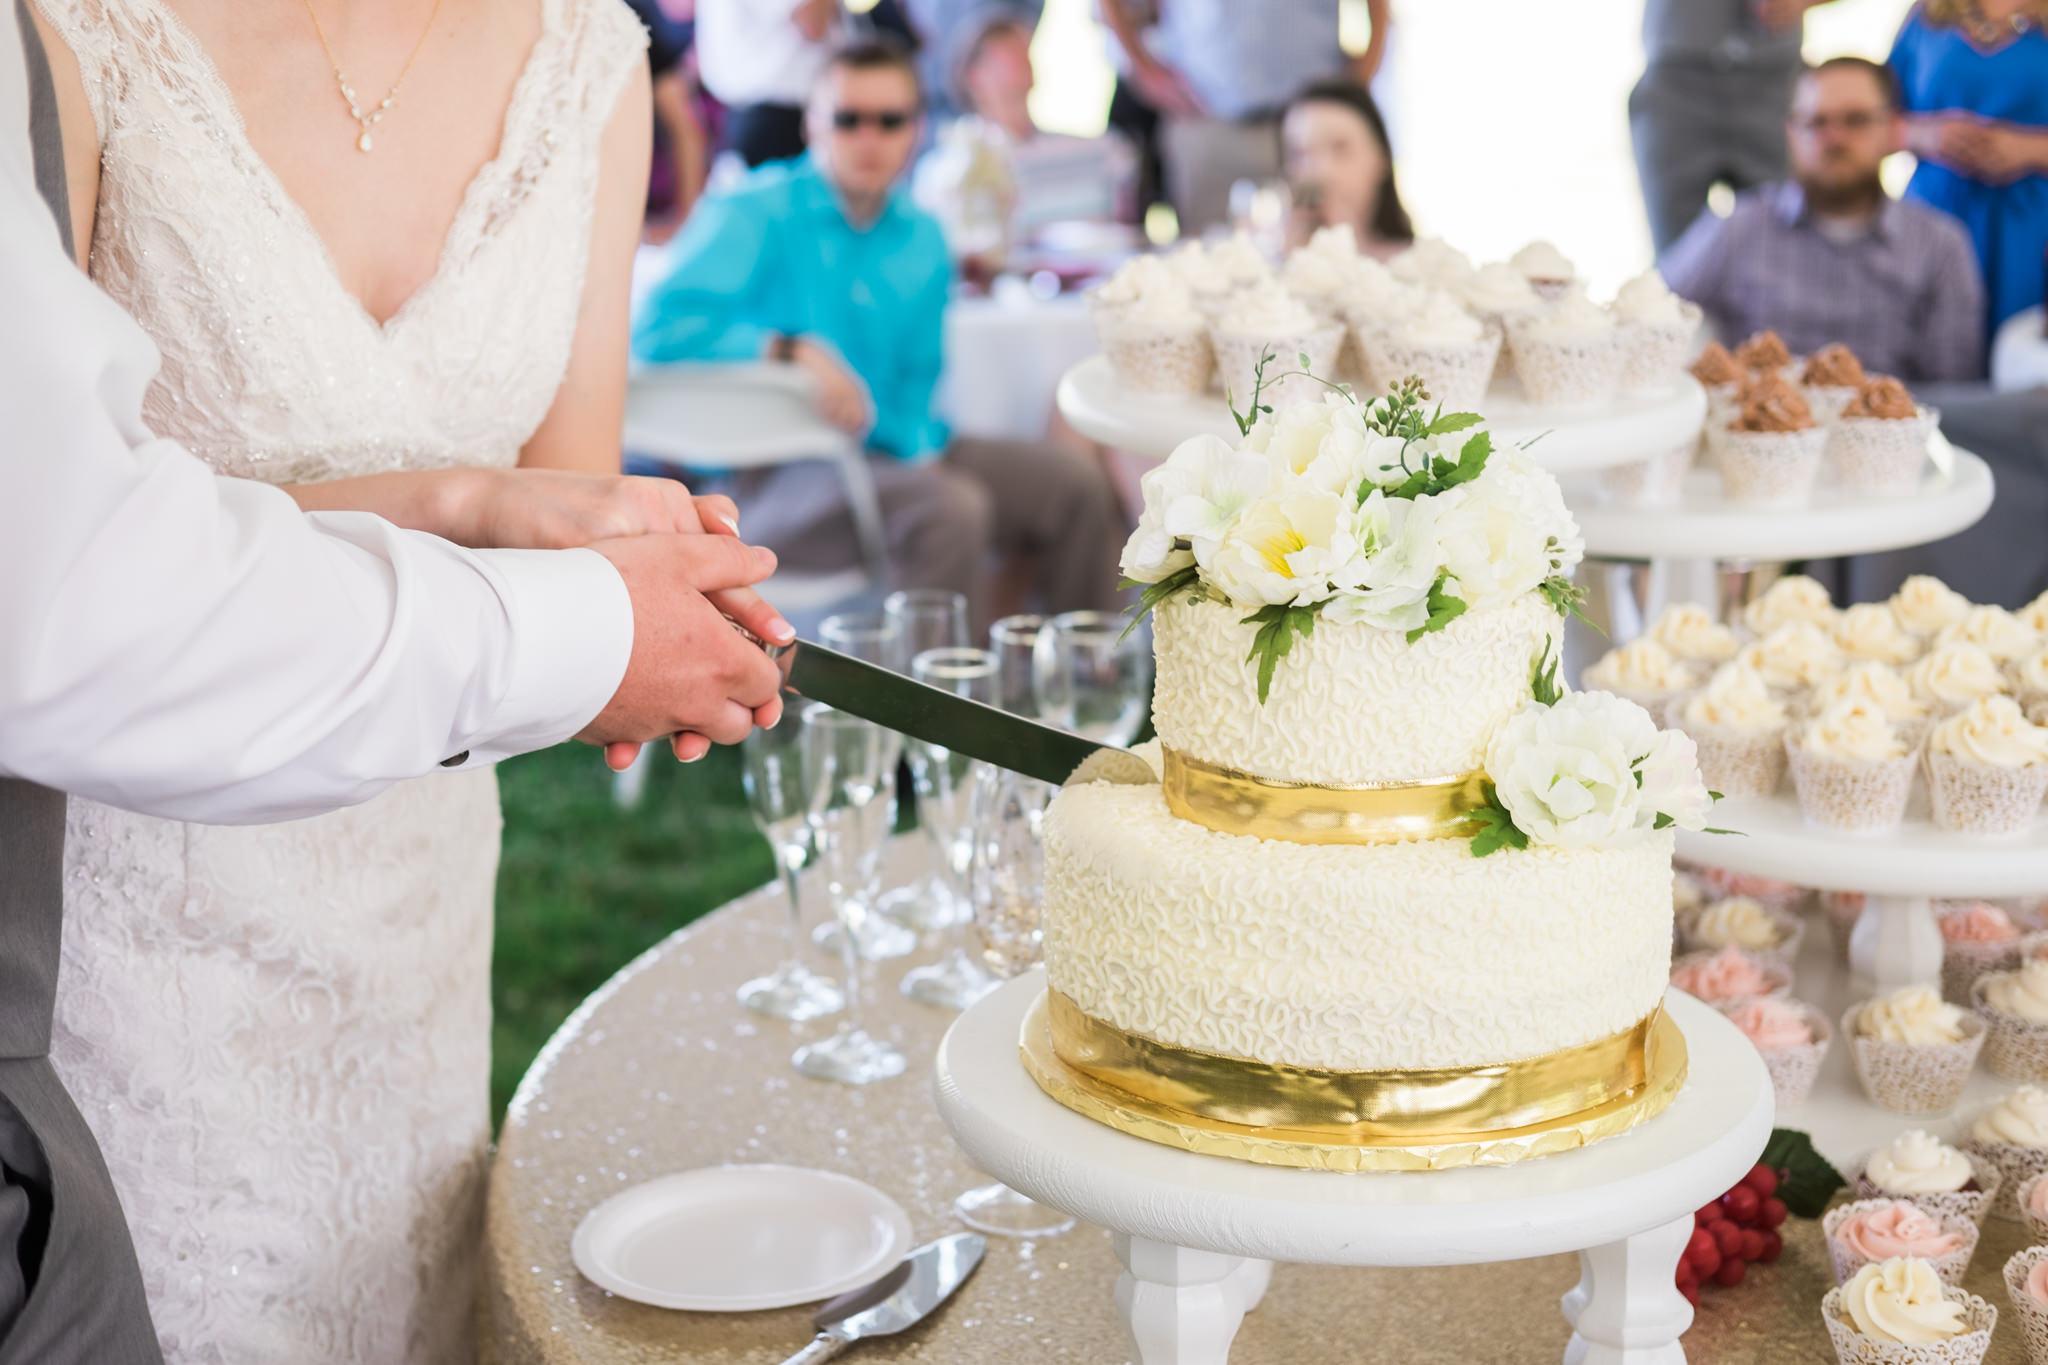 2017.06.03_Callie&Dustin_Wedding_Blog_0043.jpg